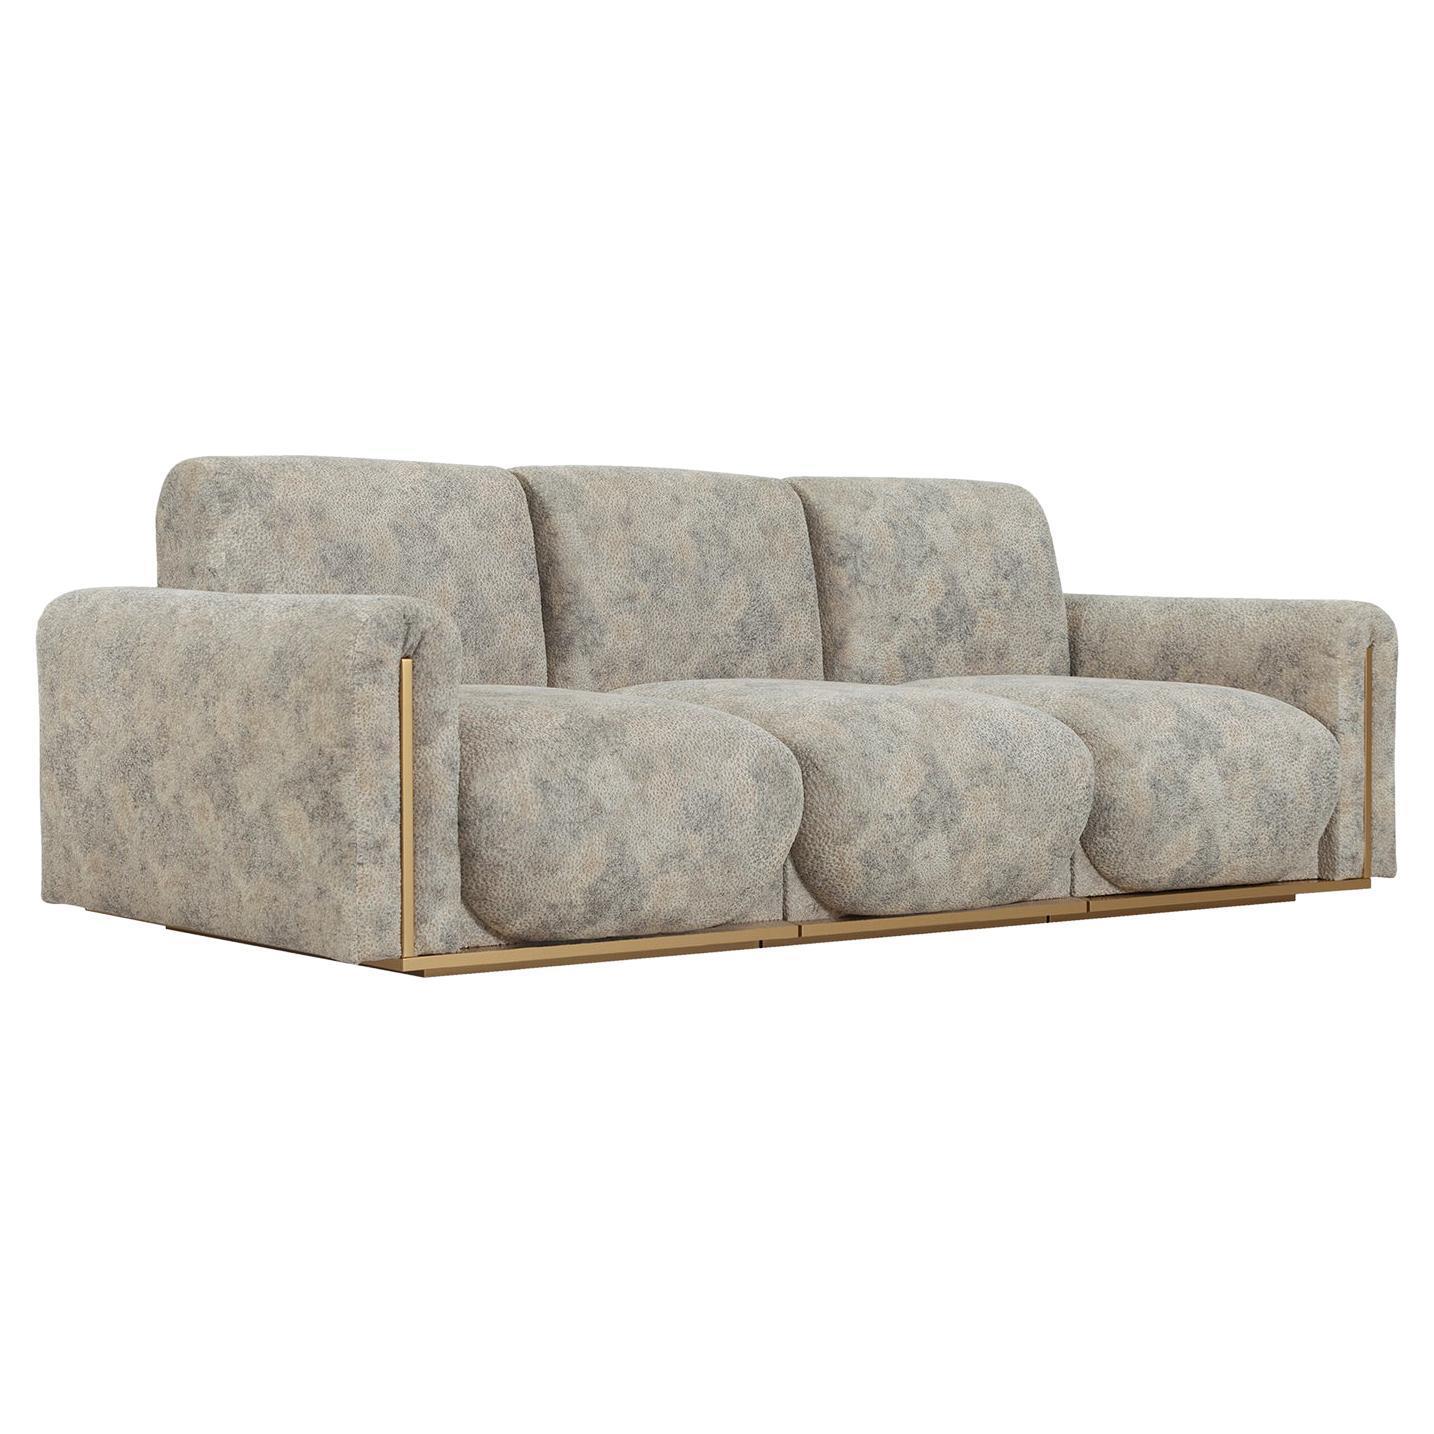 Beijinho 3-Seat Sofa Beige Jacquard-Patterned Velvet Gold Leather